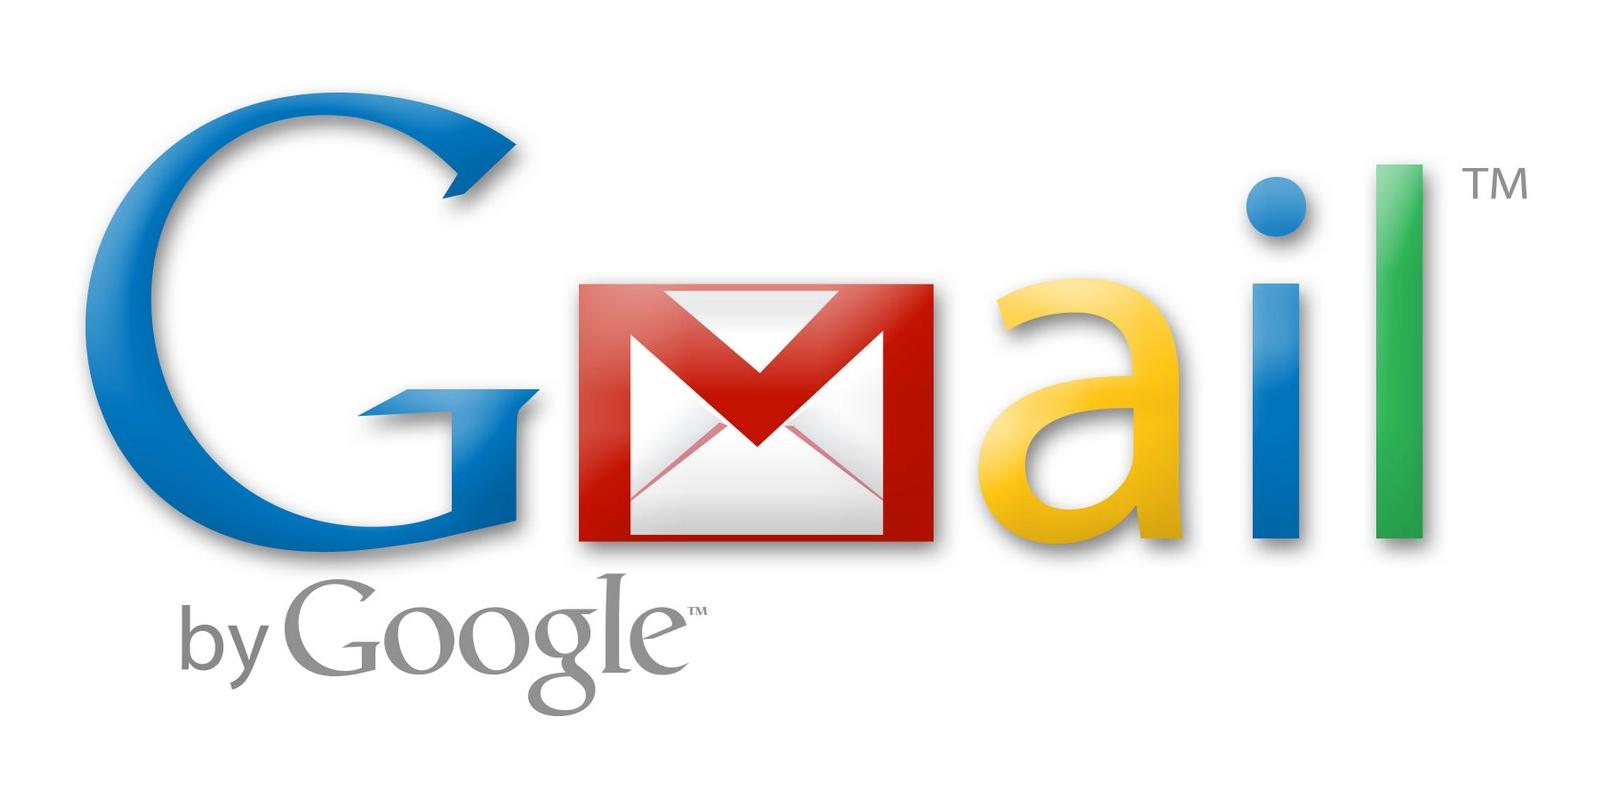 Alasan Kuat Untuk Menggunakan Gmail atau Google Mail